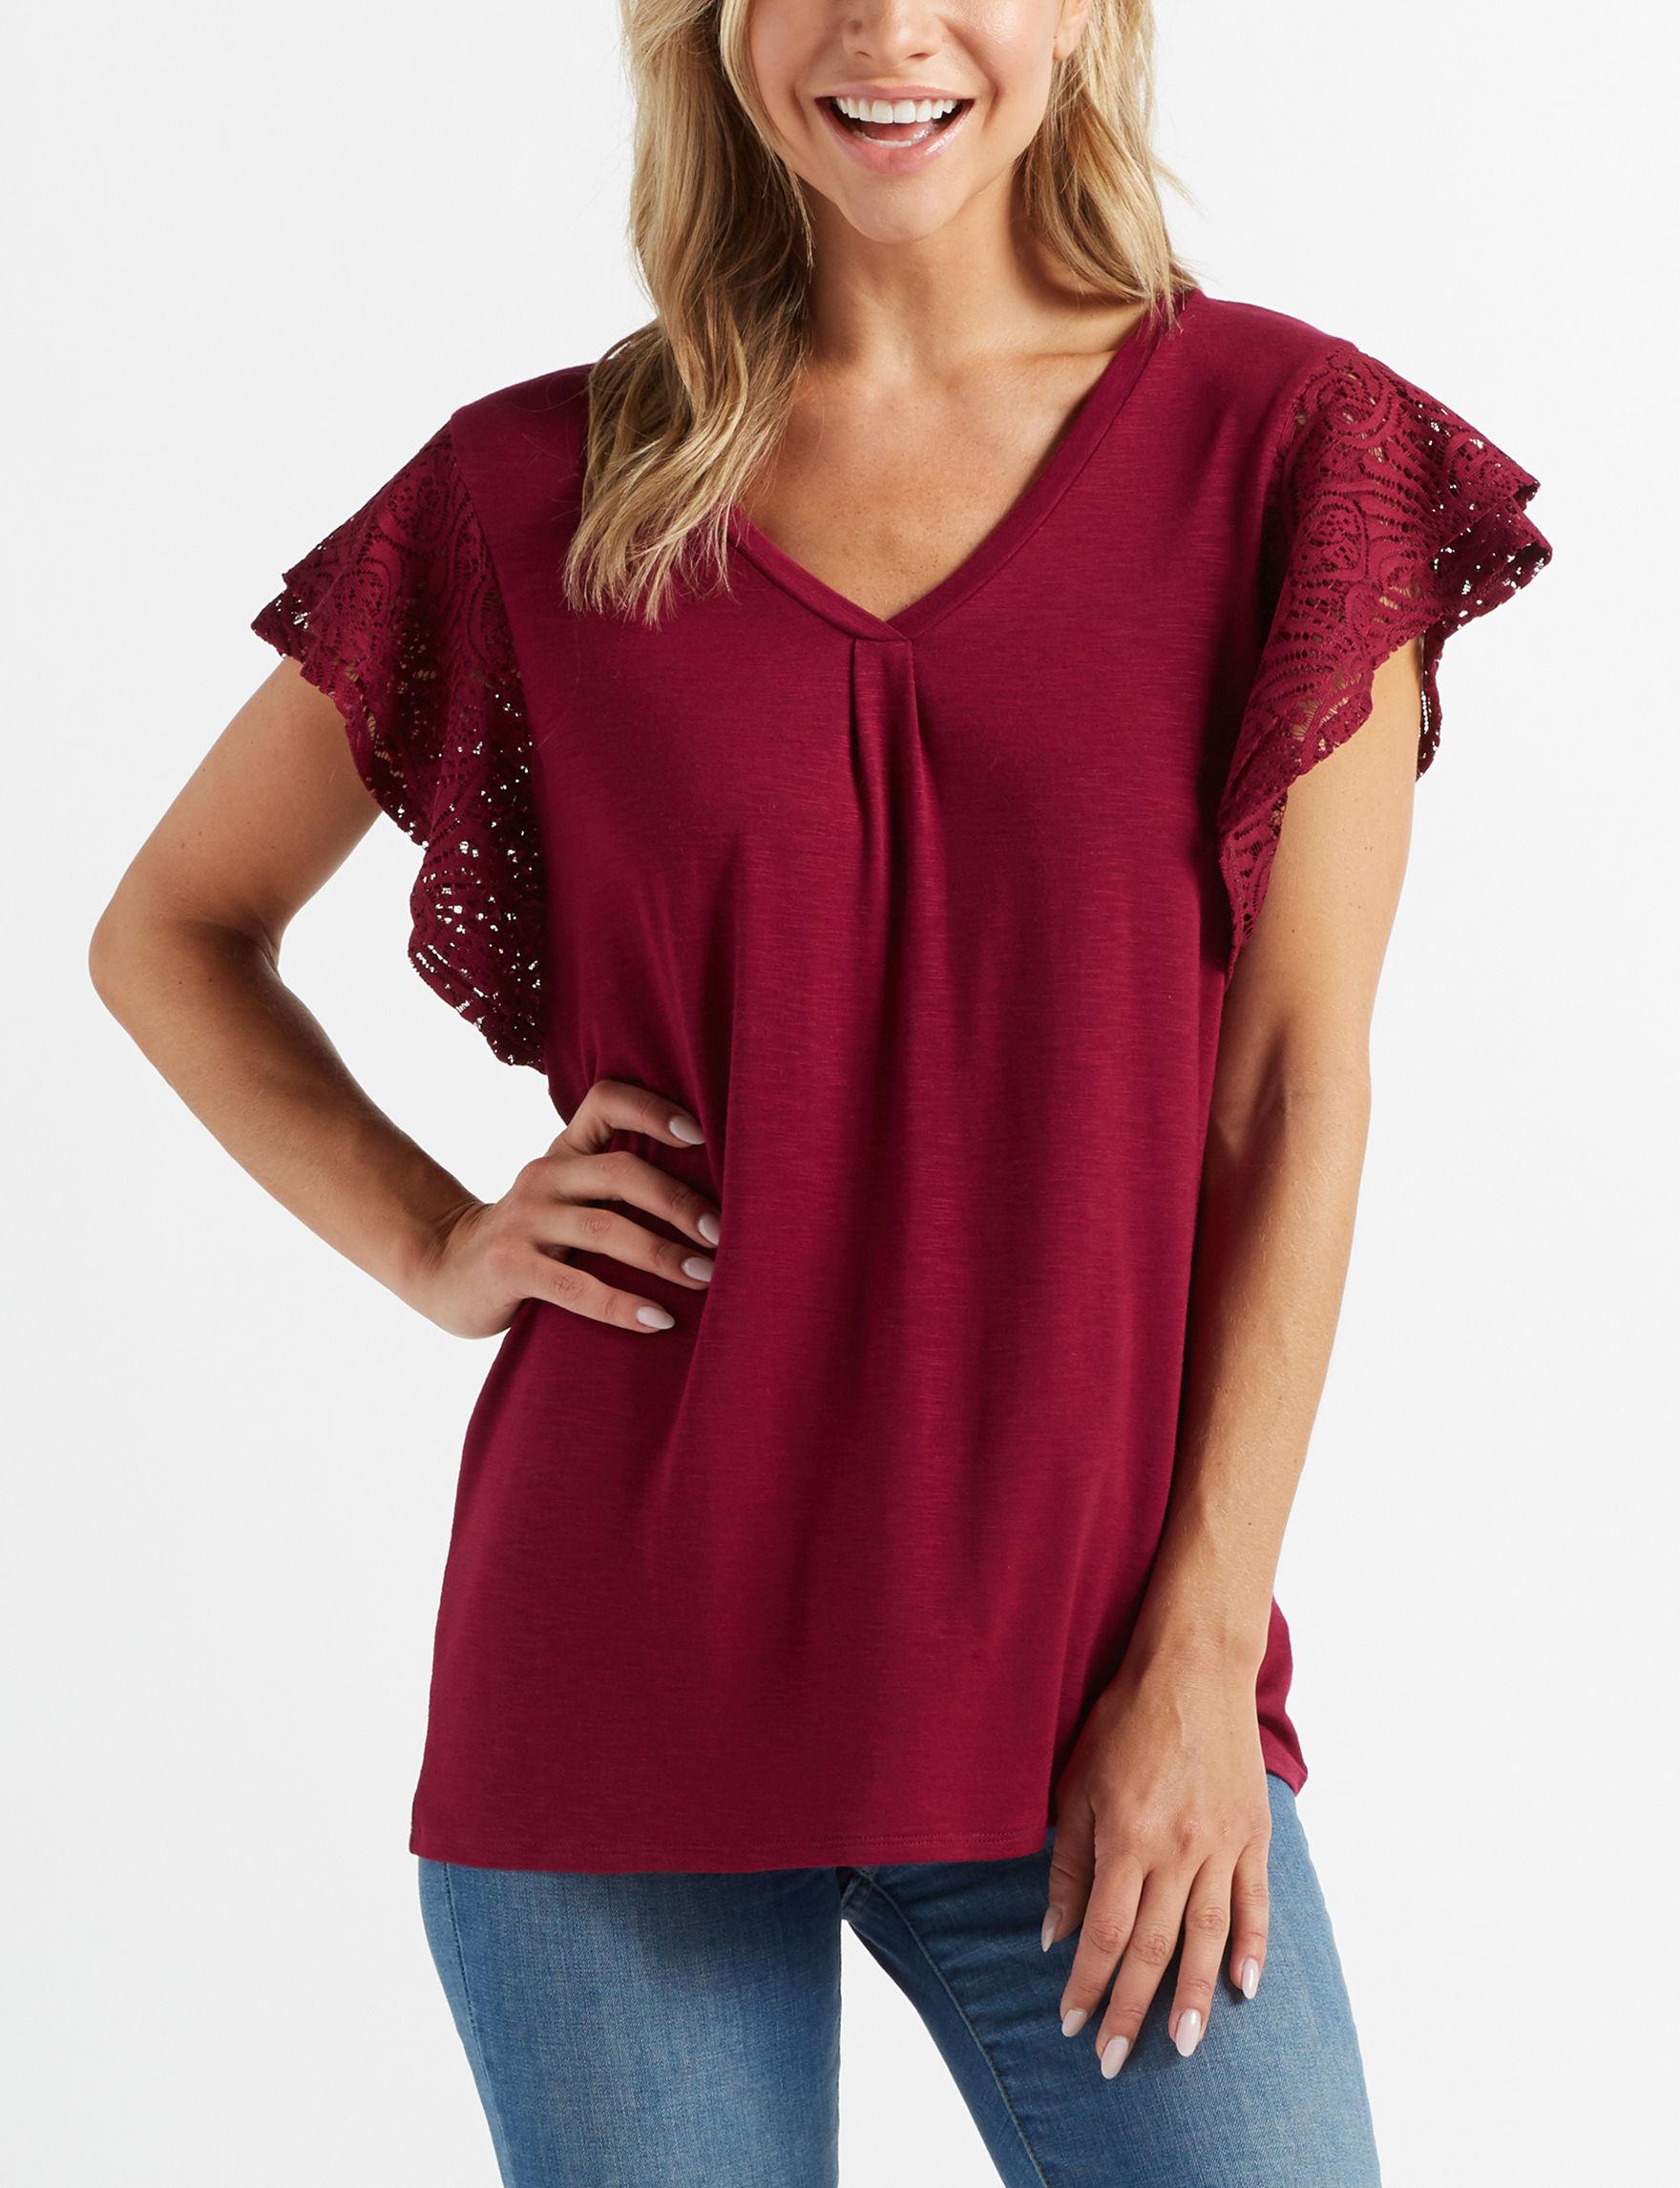 89th & Madison Burgundy Shirts & Blouses